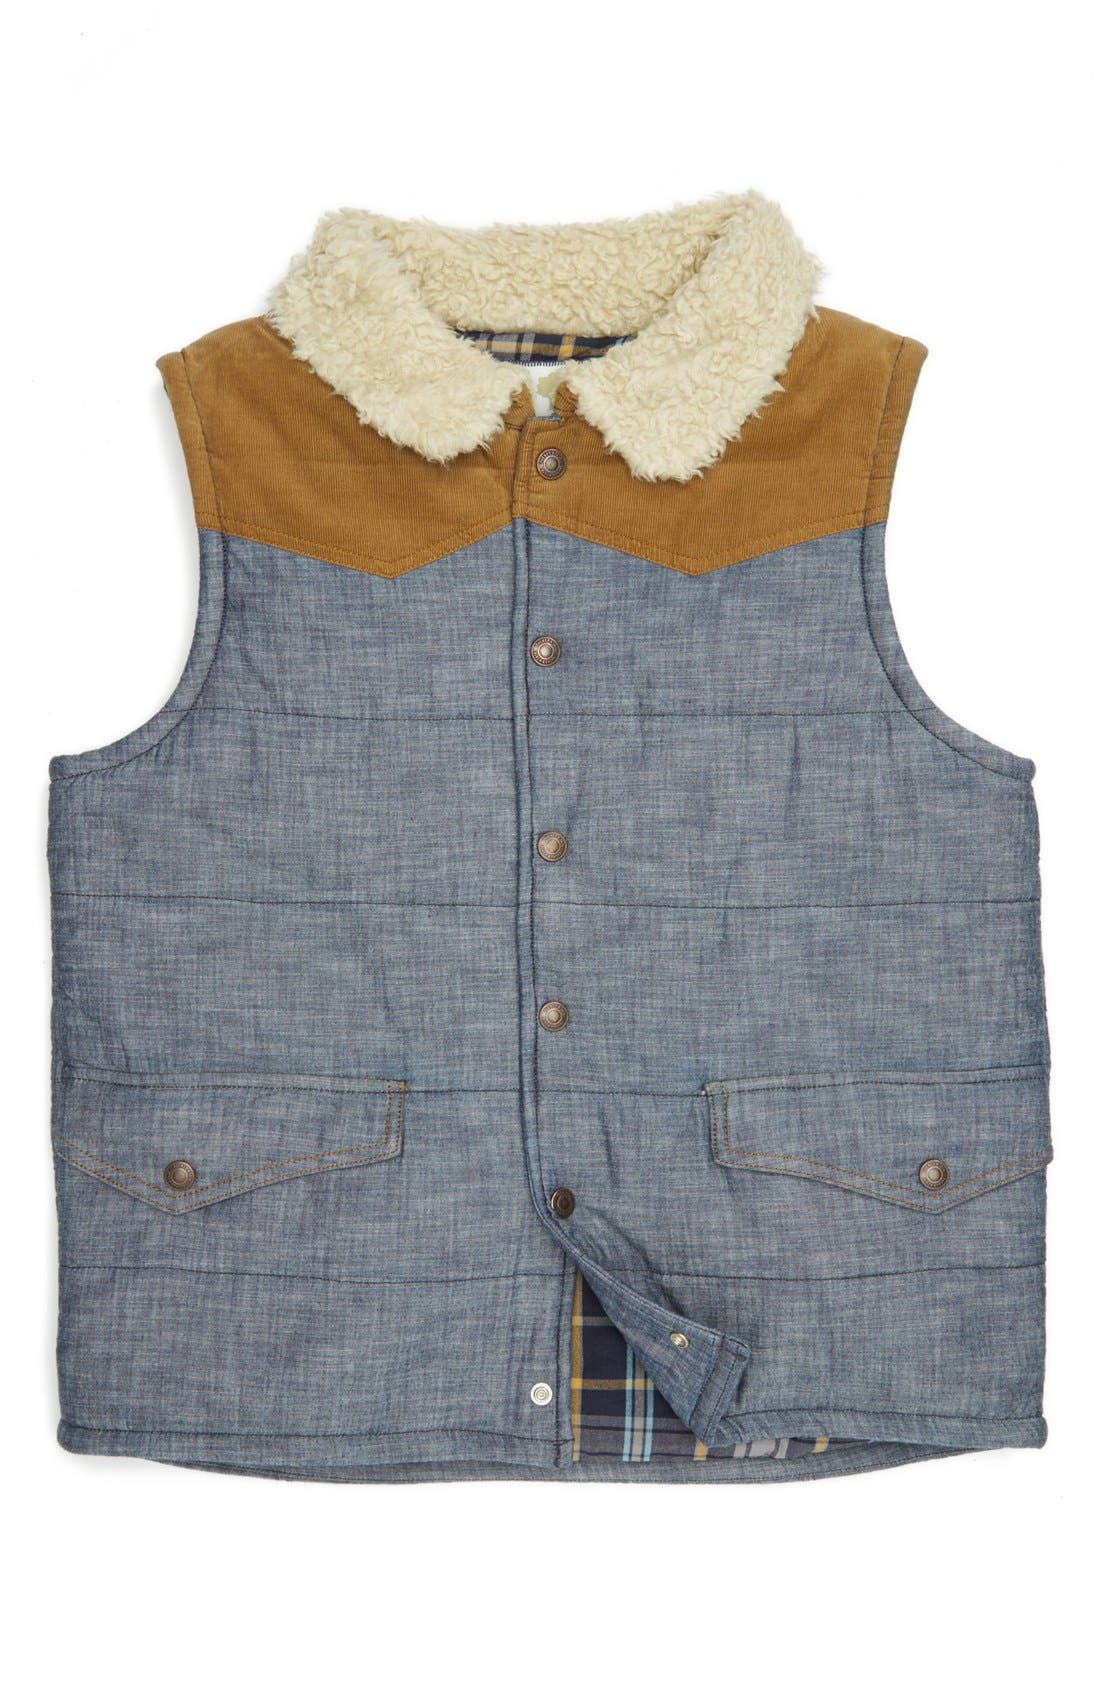 Alternate Image 1 Selected - Tucker + Tate 'Viewridge' Quilted Vest (Big Boys)